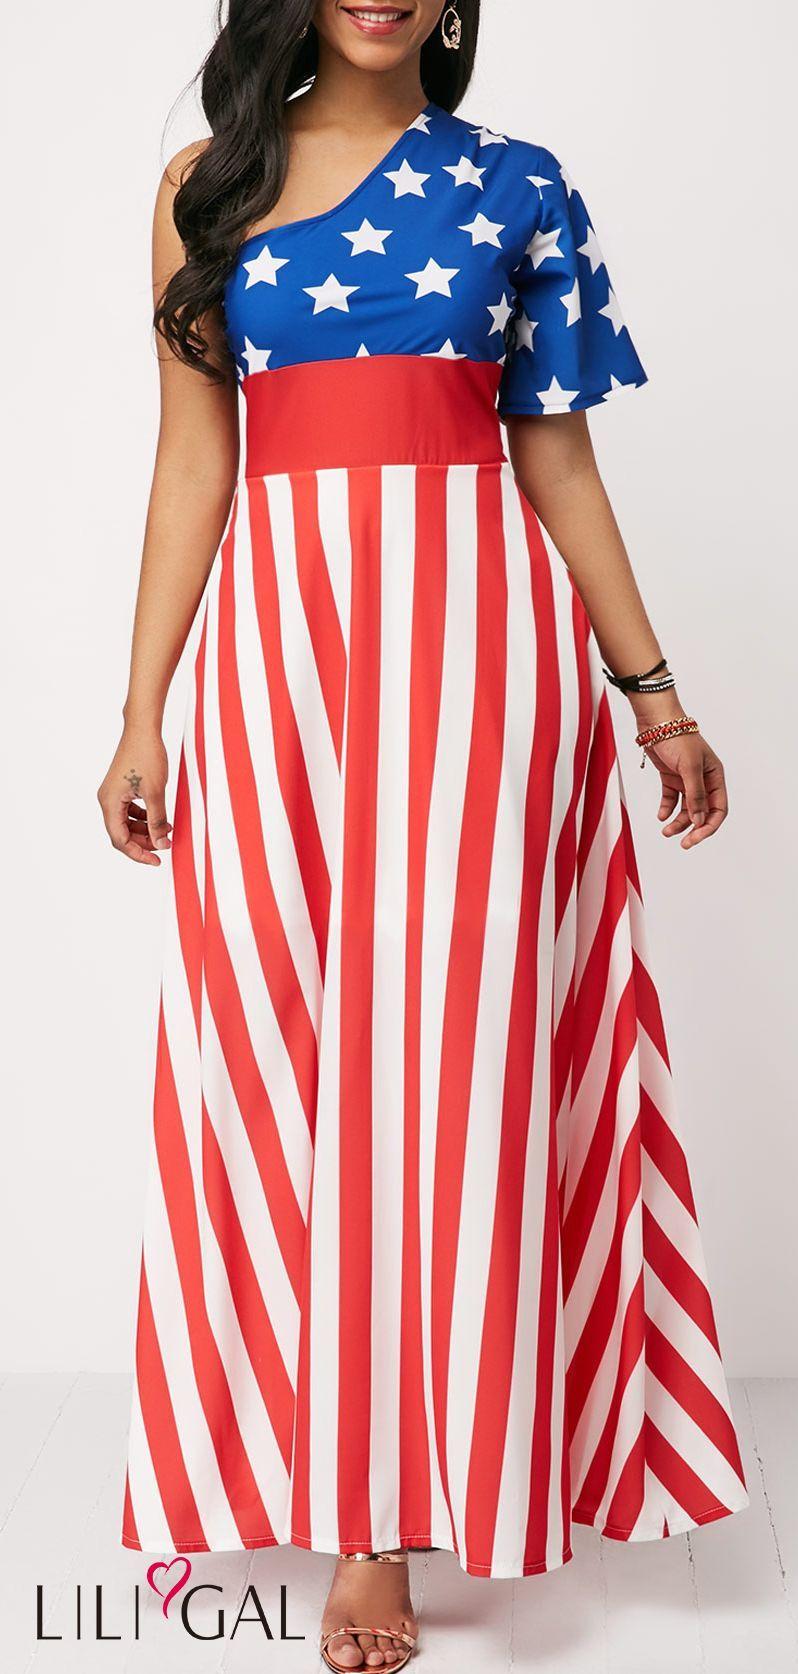 4d3191959cd Short Sleeve One Shoulder High Waist Maxi Dress  liligal  4thofjuly   fourthofjuly  patriotic